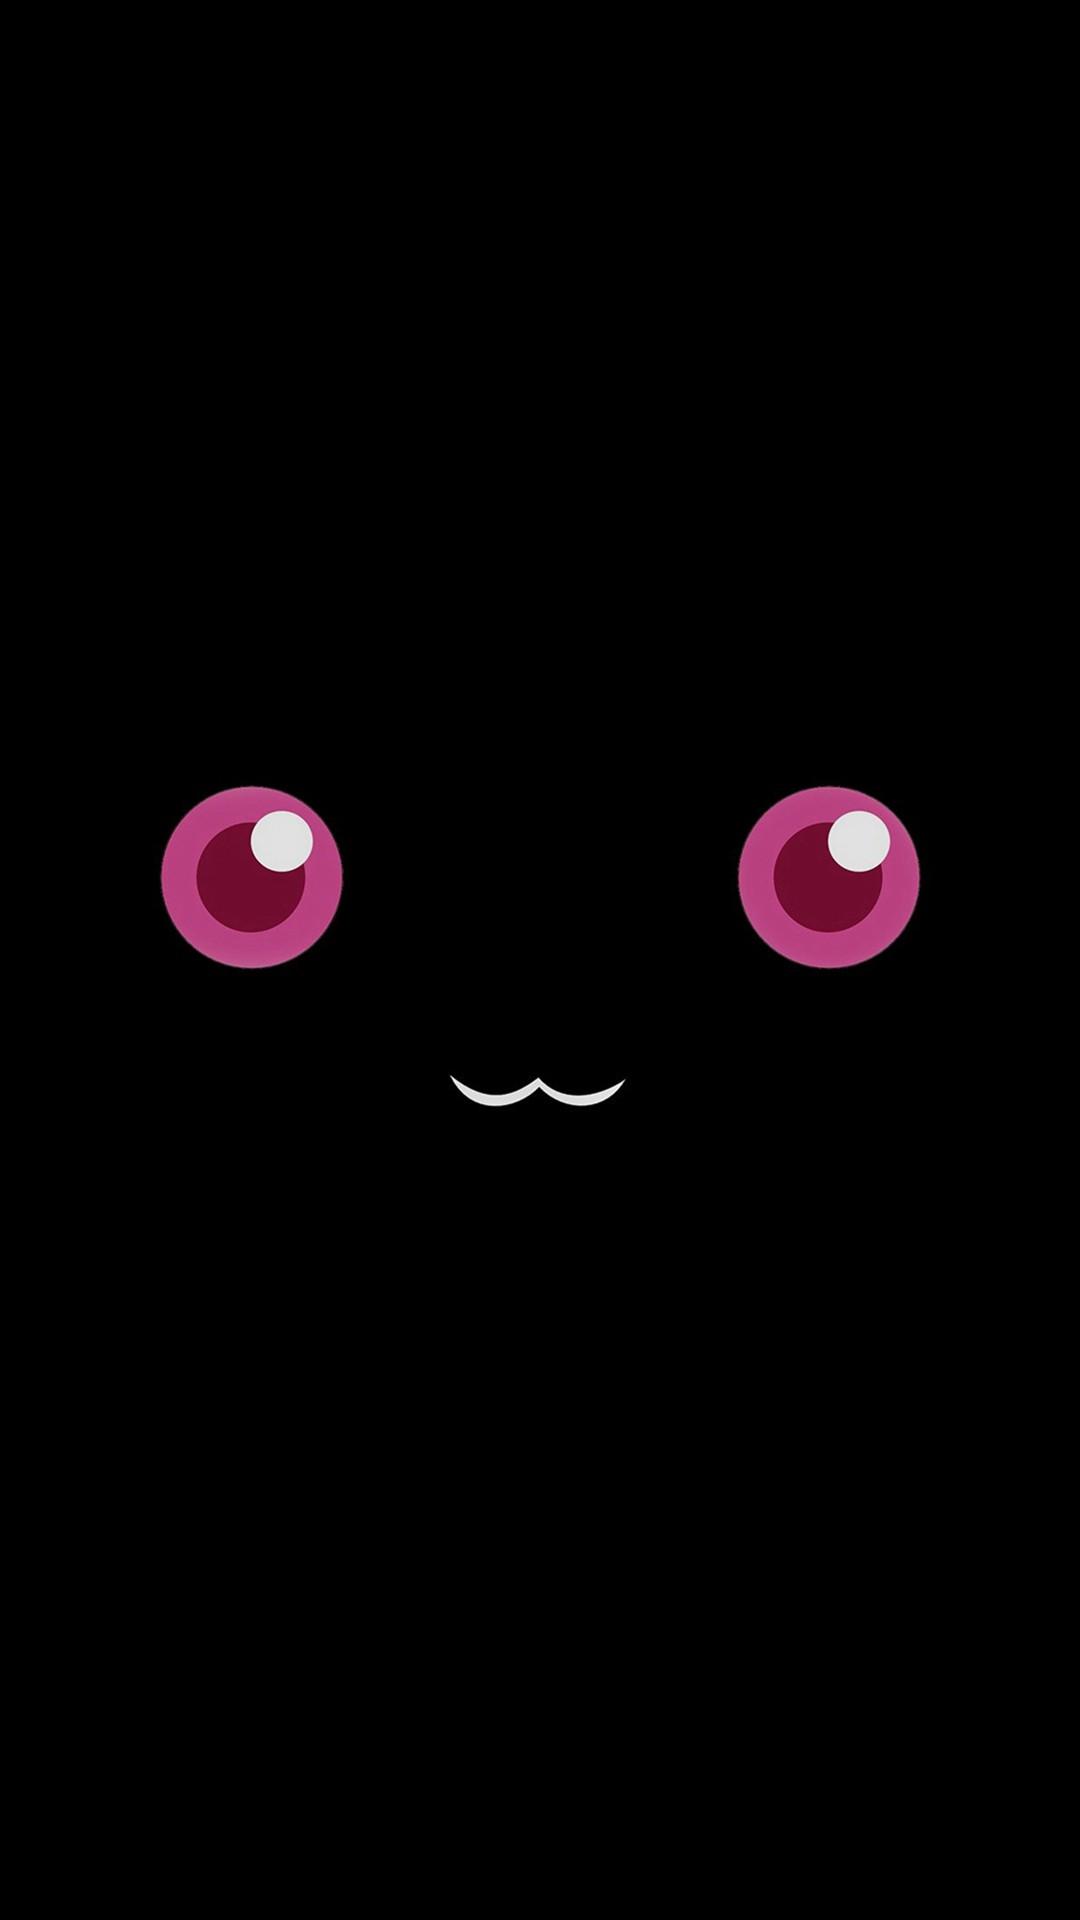 Cute Pokemon Dark Character Anime Minimal #iPhone #6 #wallpaper